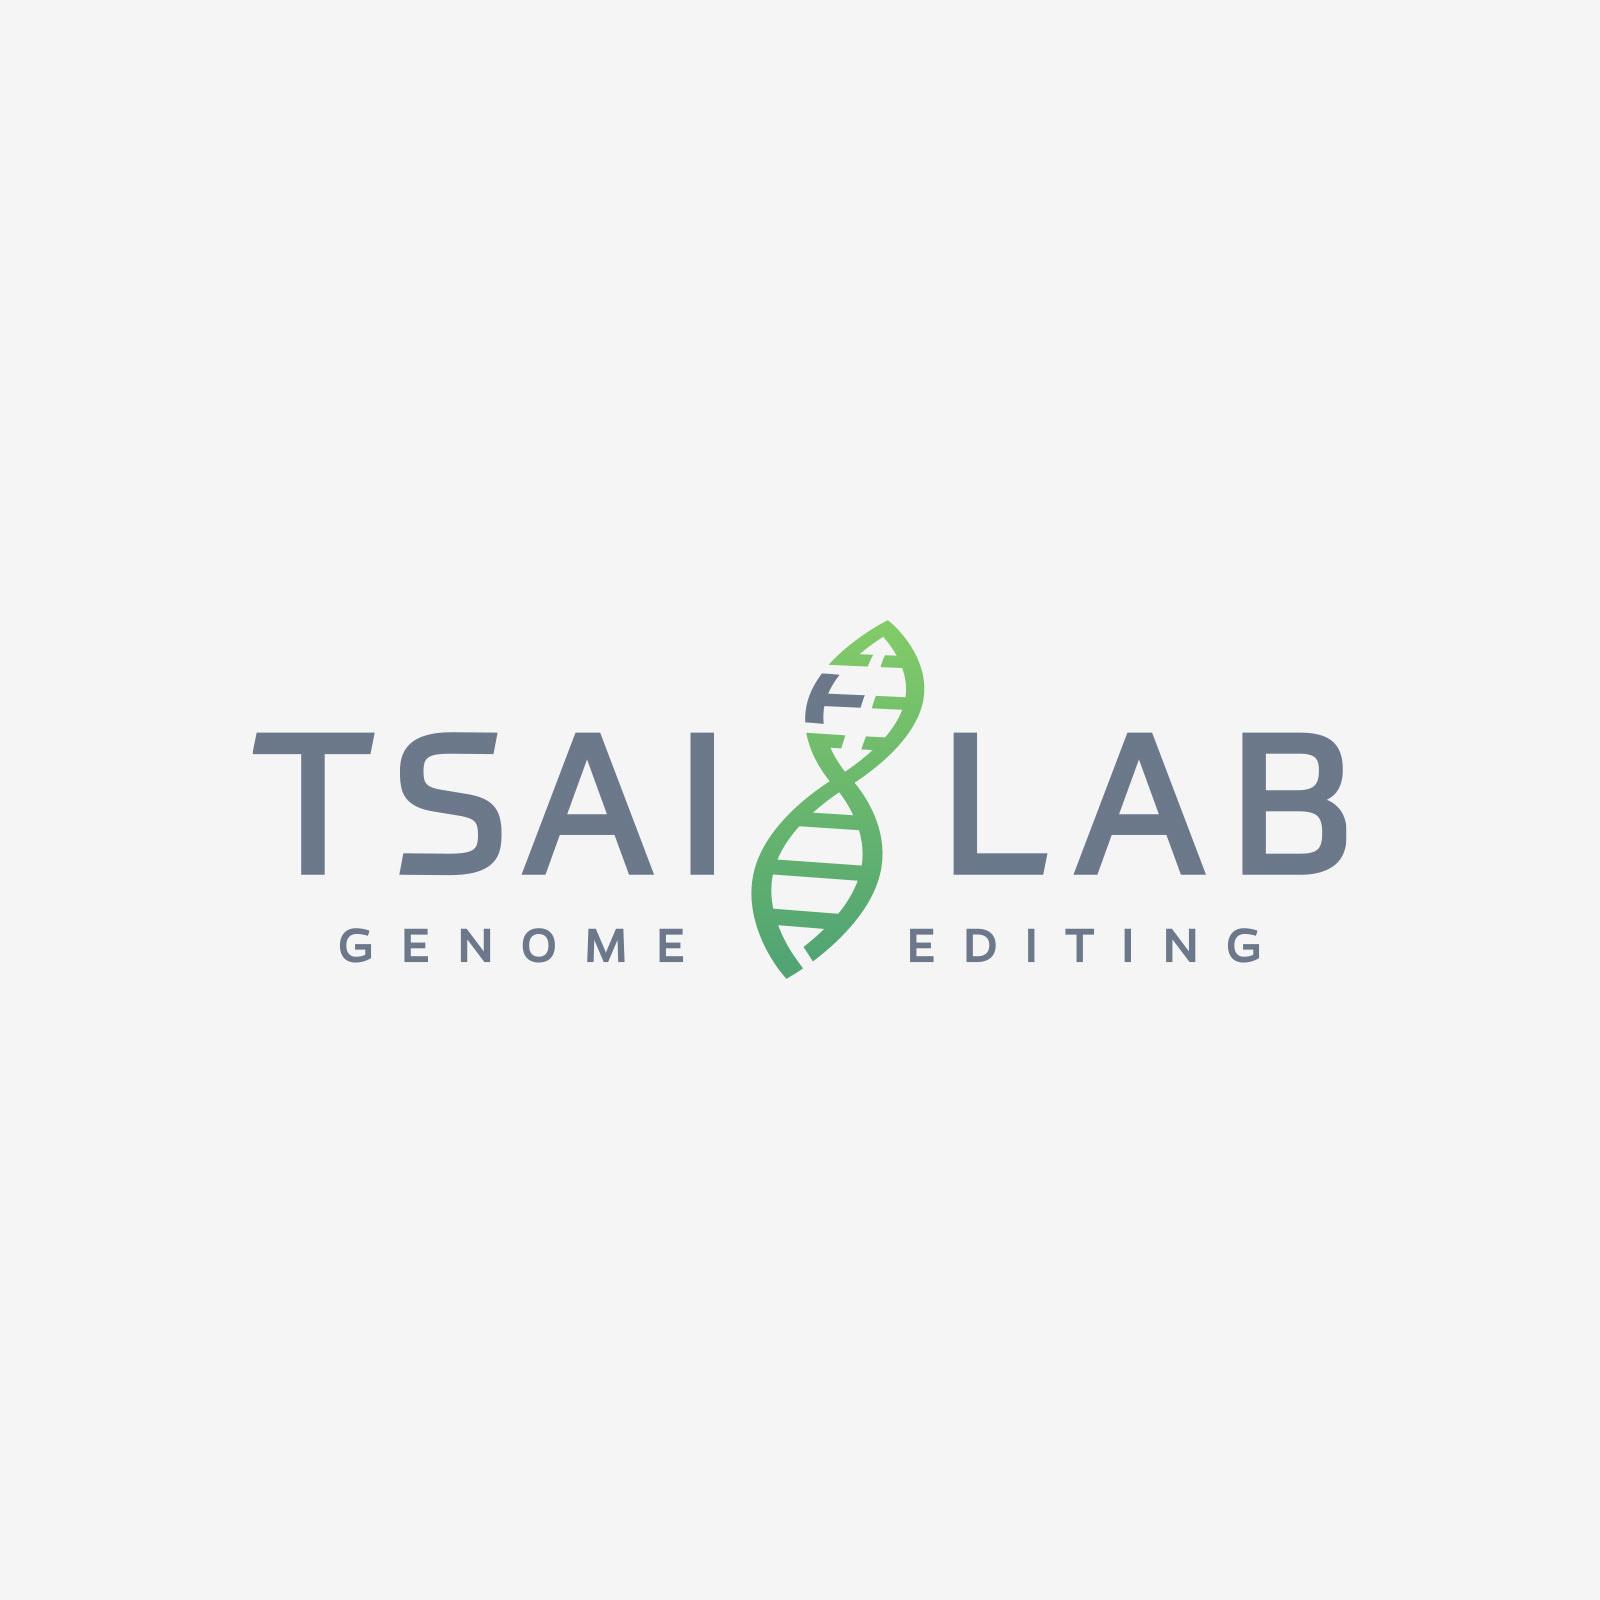 Logo design for Tsai Lab